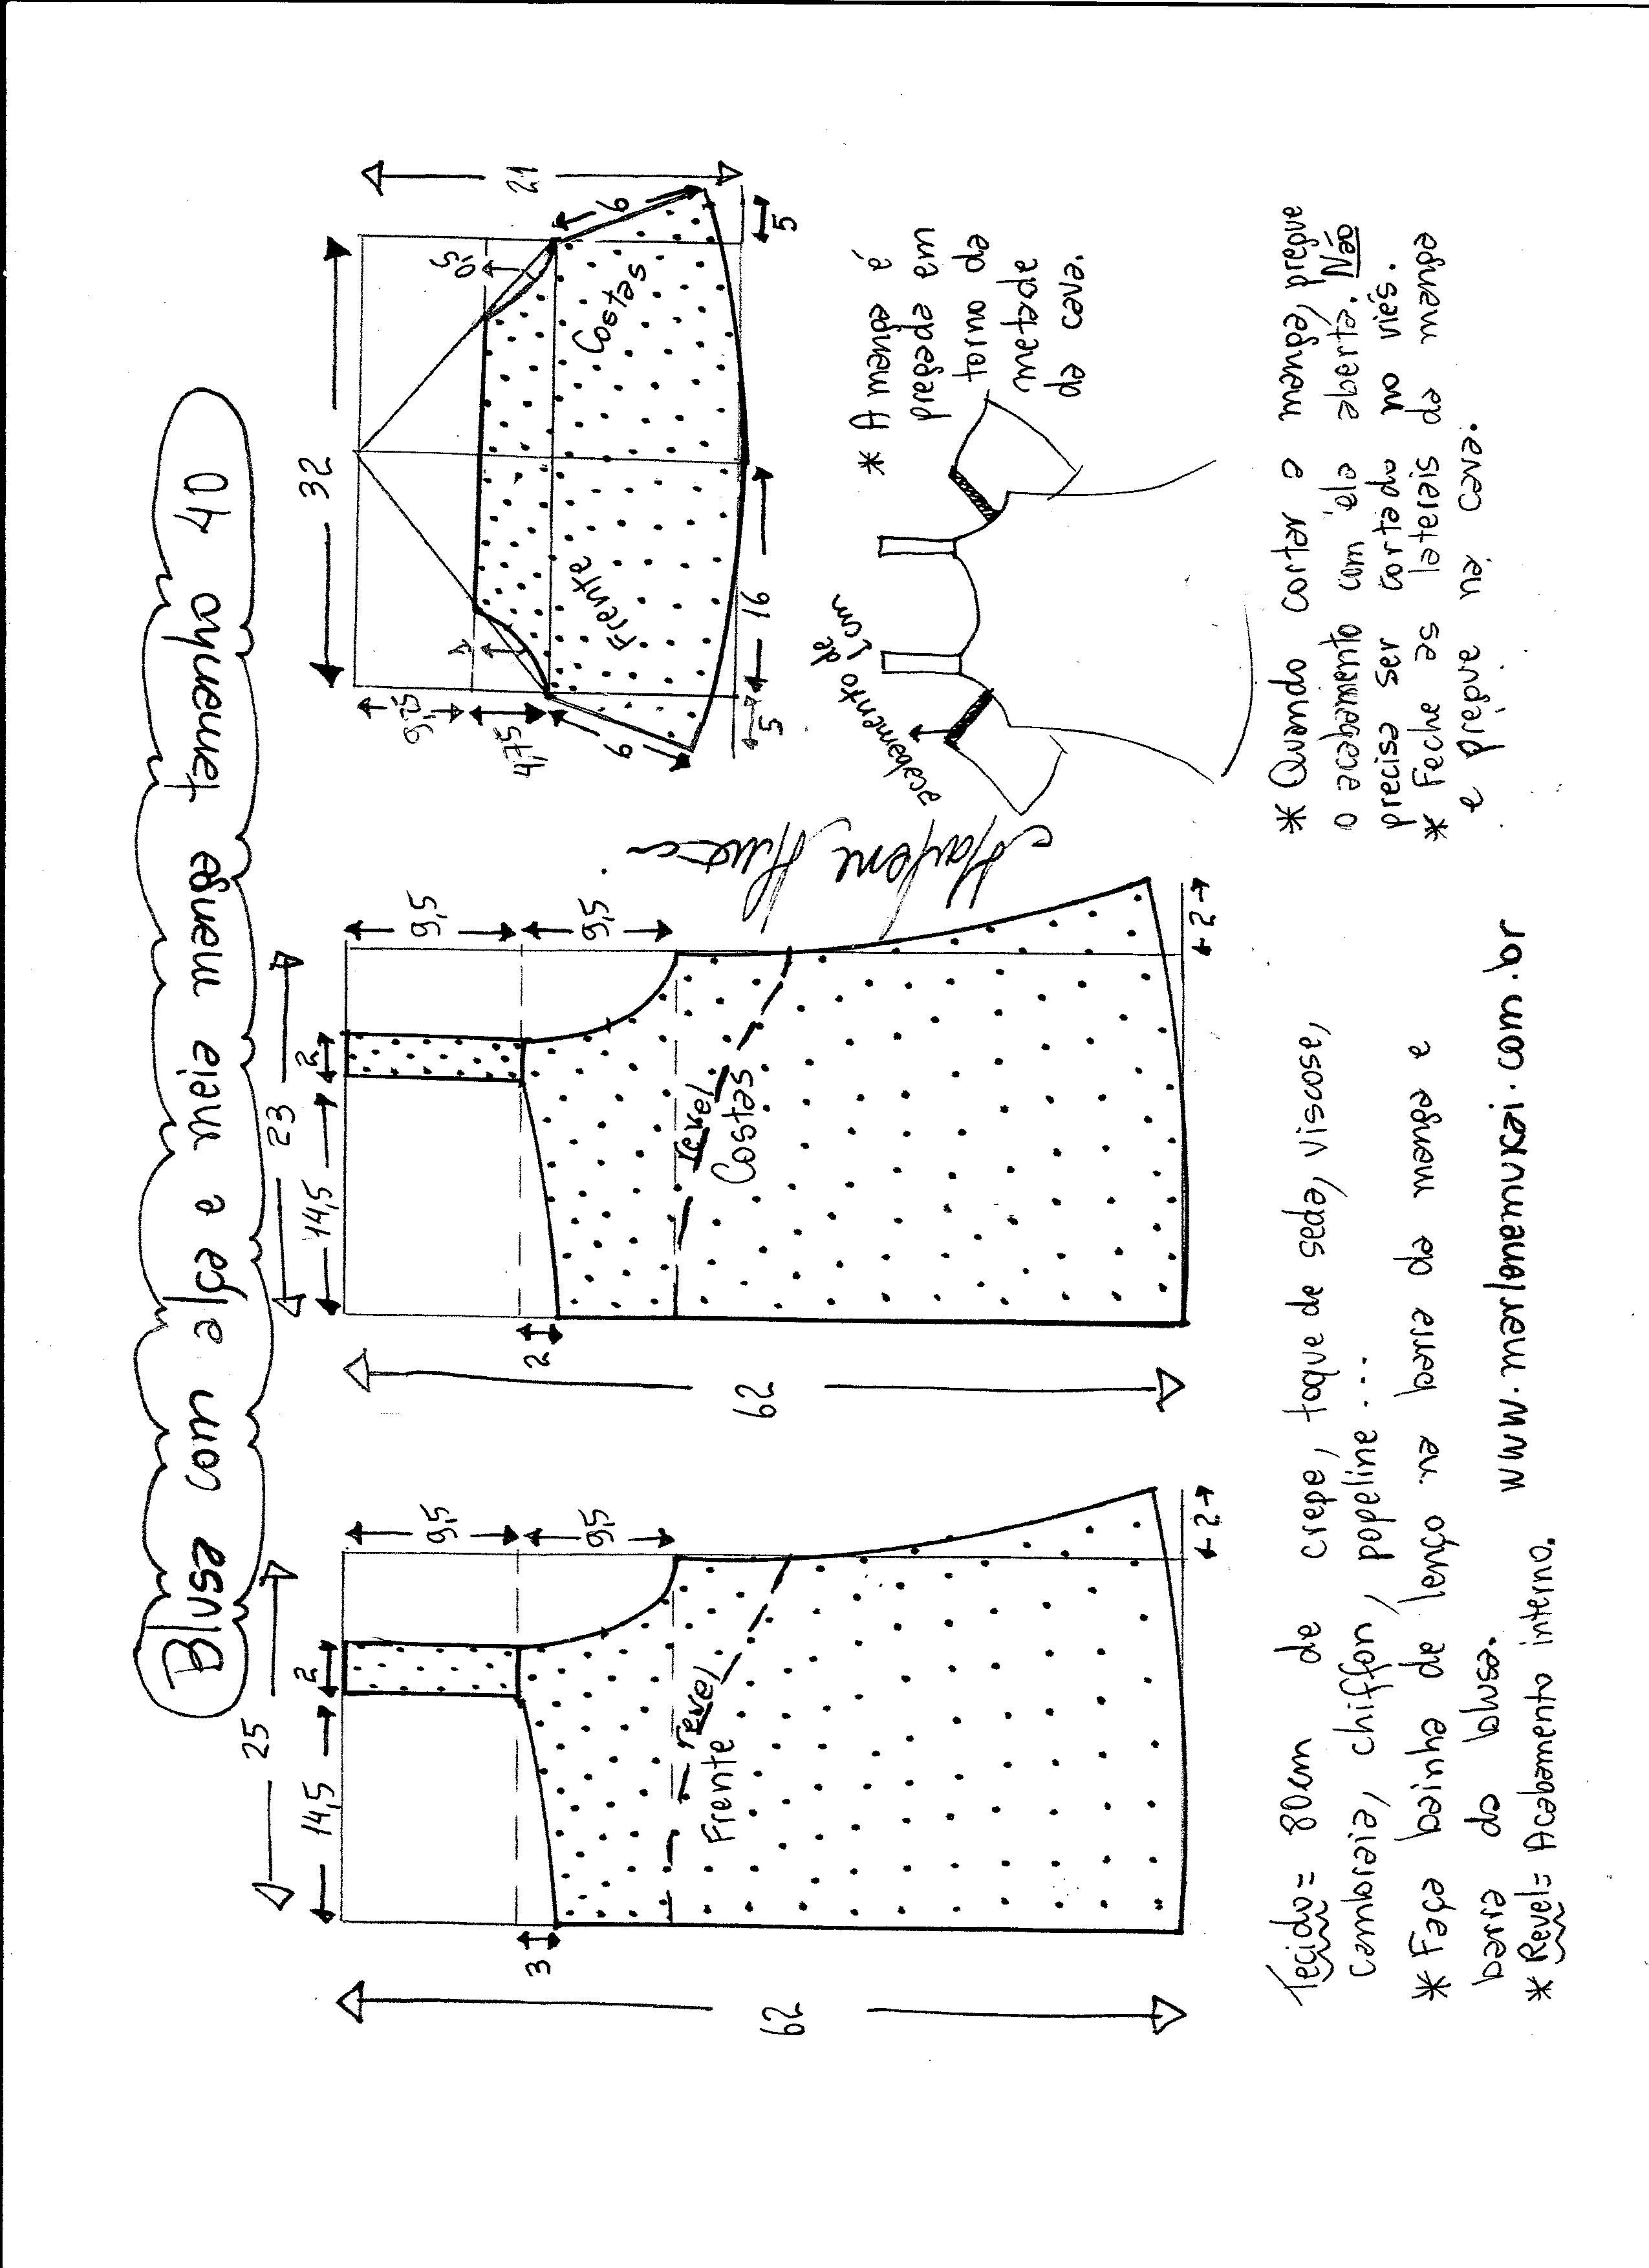 Pin by Nidia Girot on nidia girot   Pinterest   Sewing, Pattern and ...